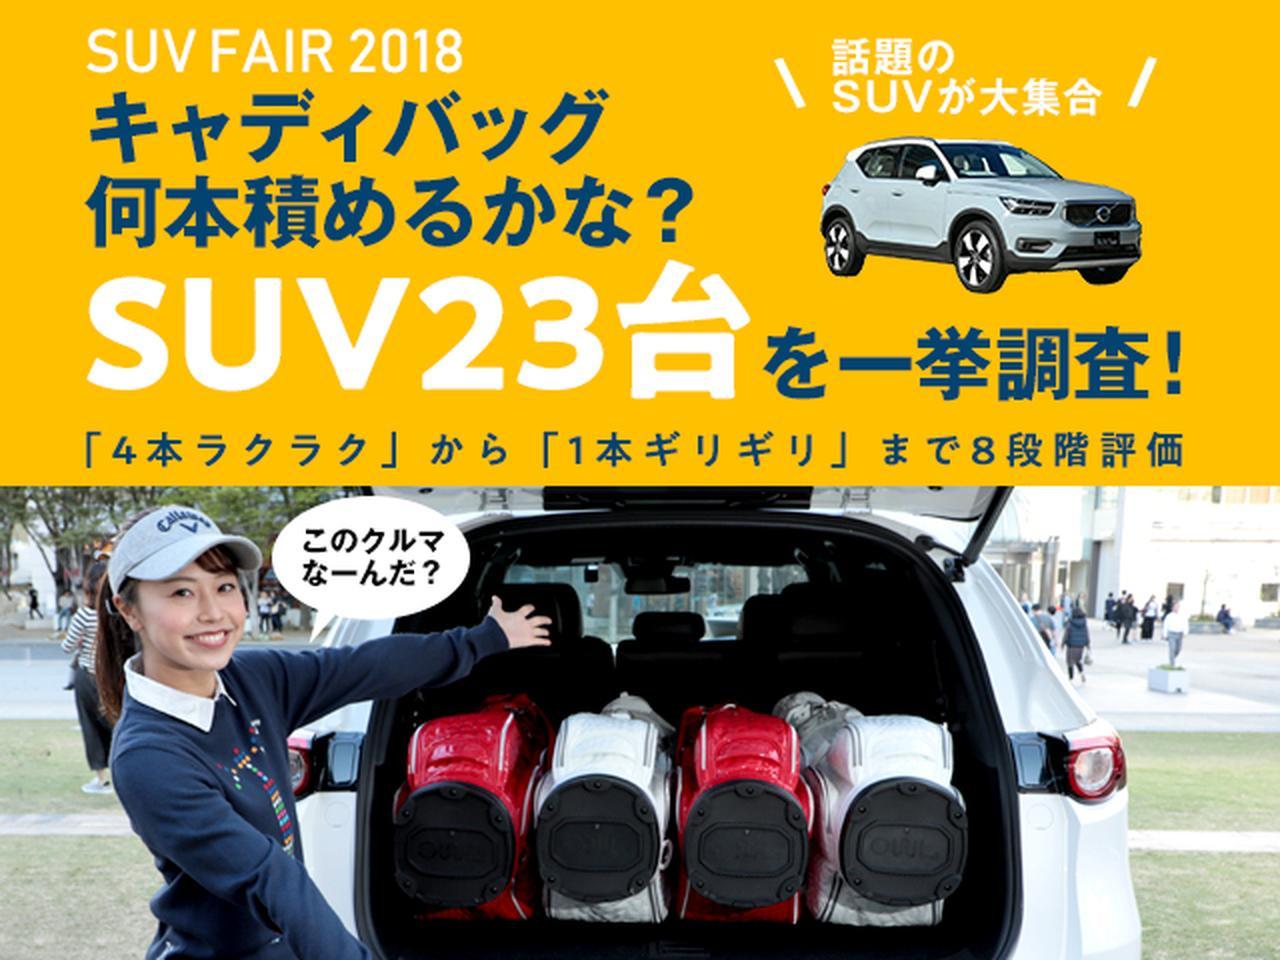 SUVフェア2018